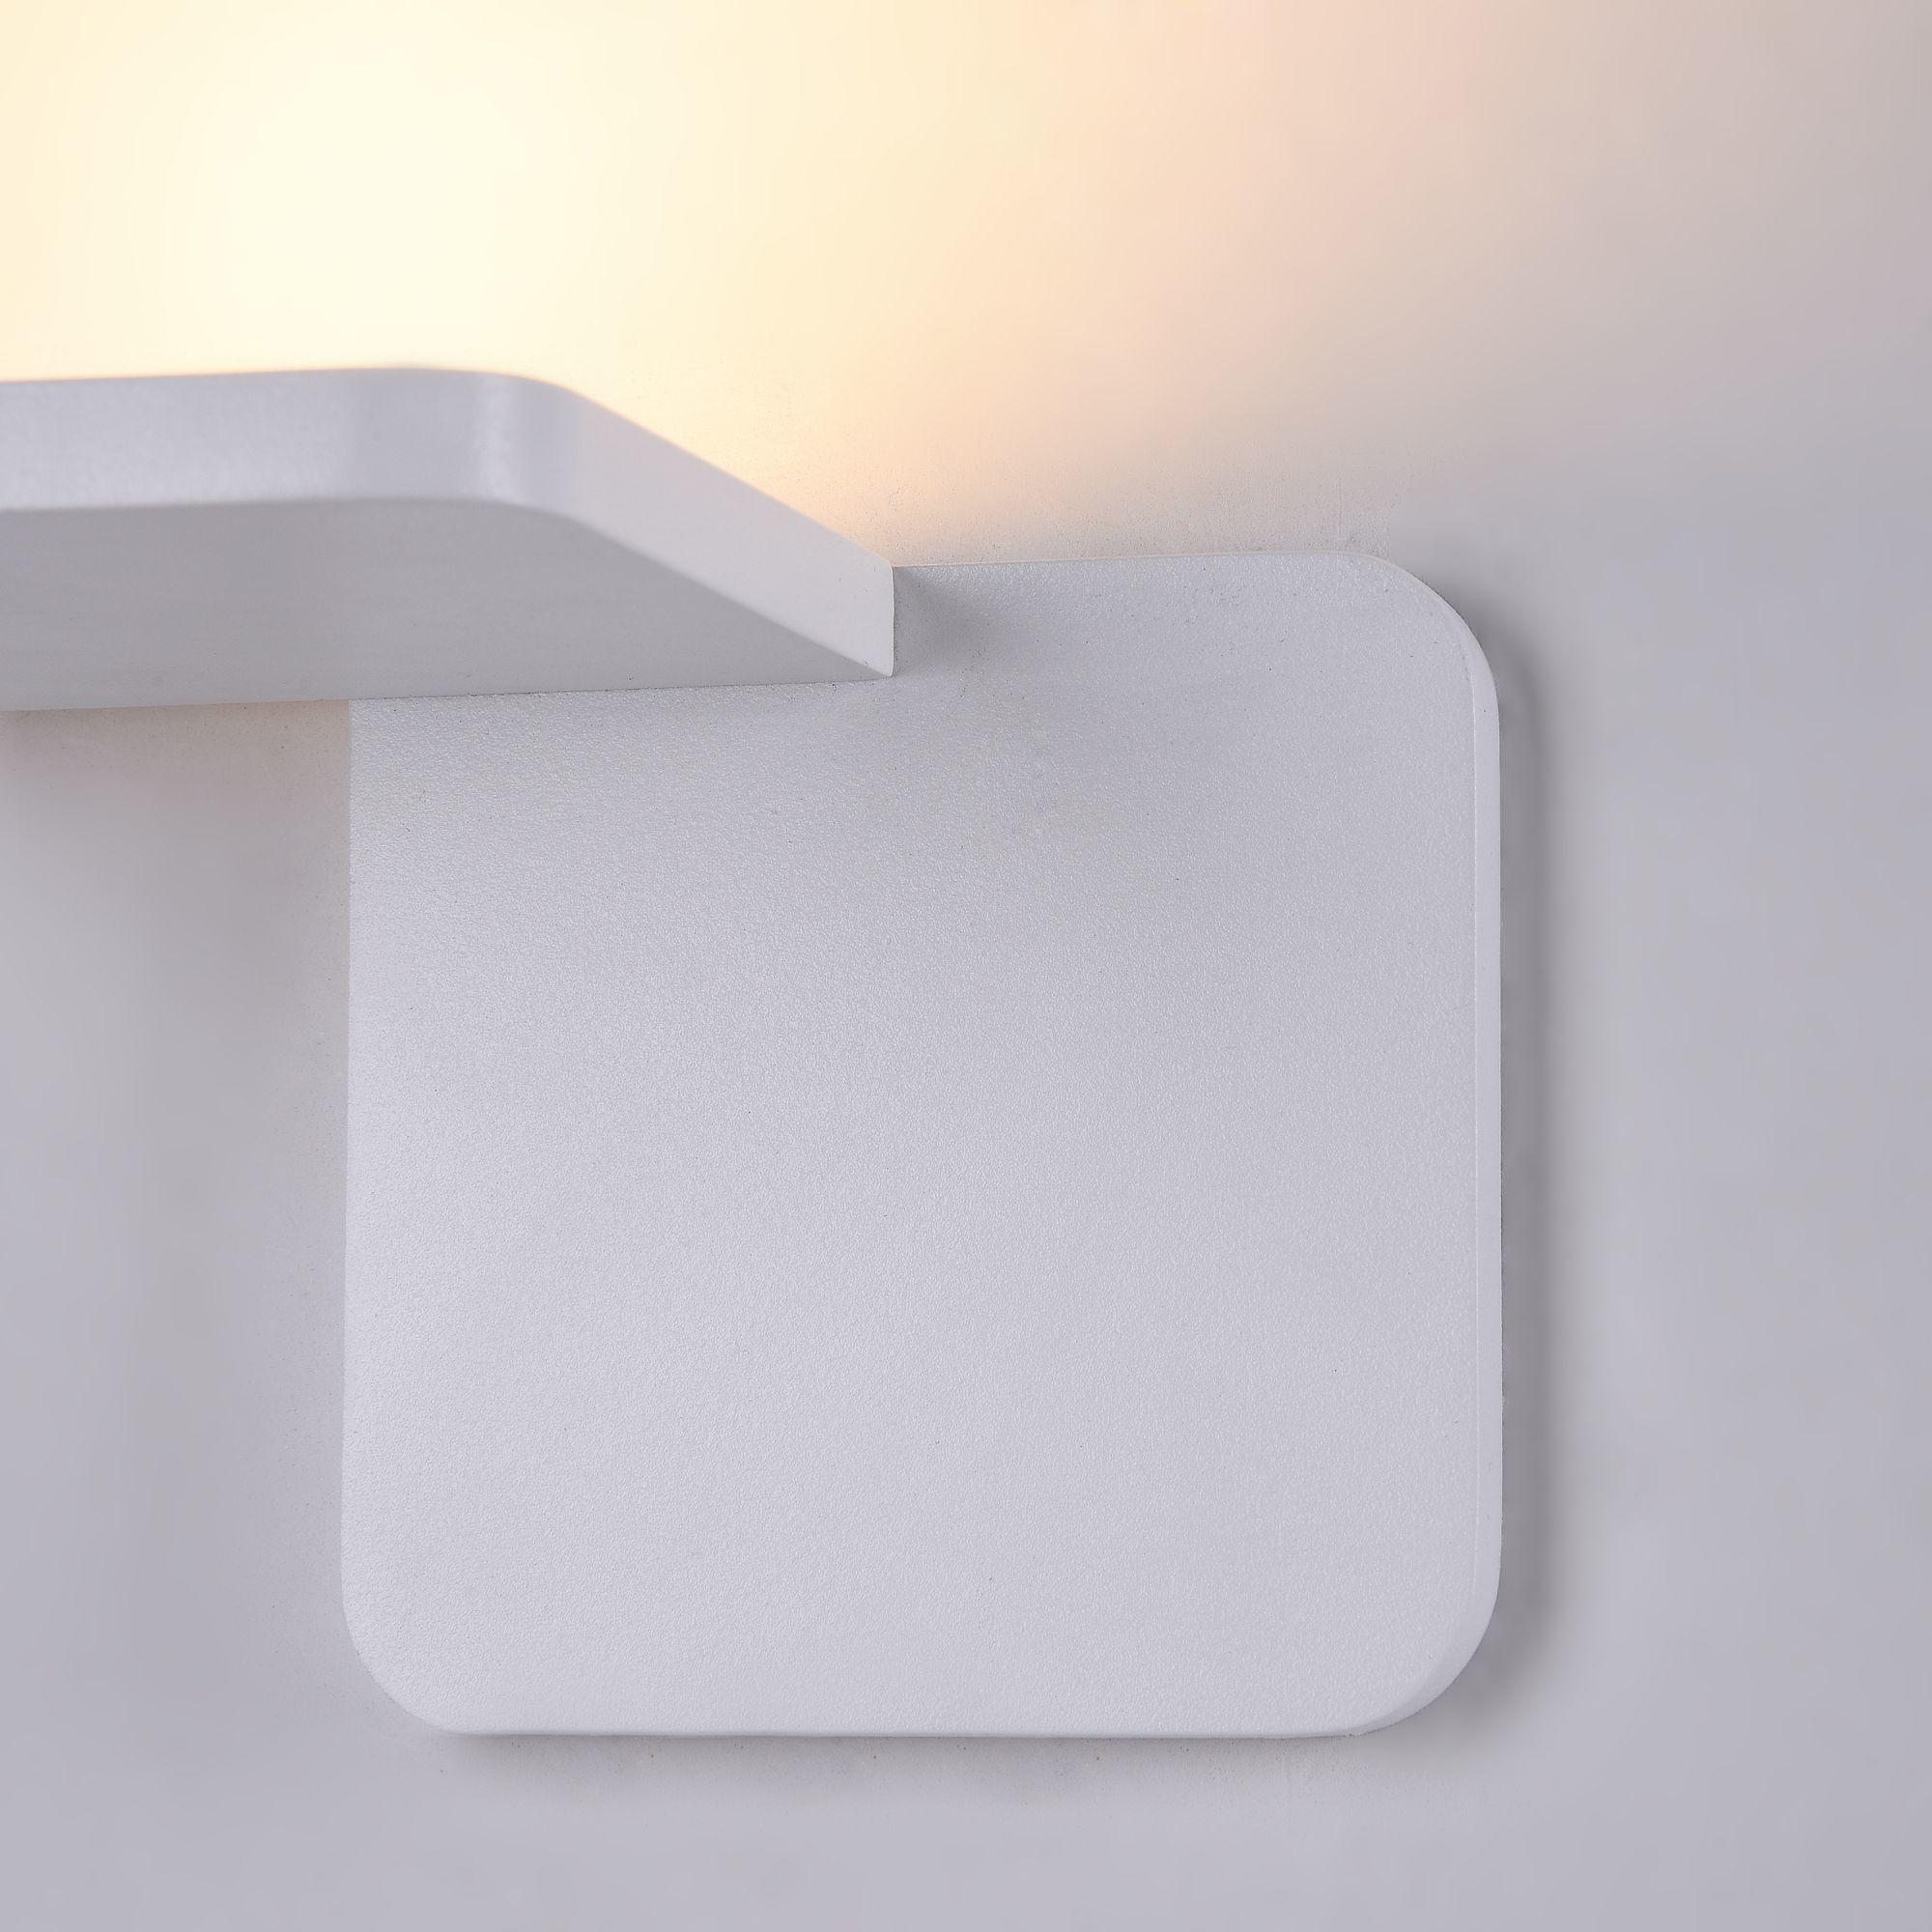 Настенный светодиодный светильник Maytoni Trame C807WL-L7W, LED SMD 2835 7W 3000K 350lm CRI84, белый, металл, стекло - фото 6